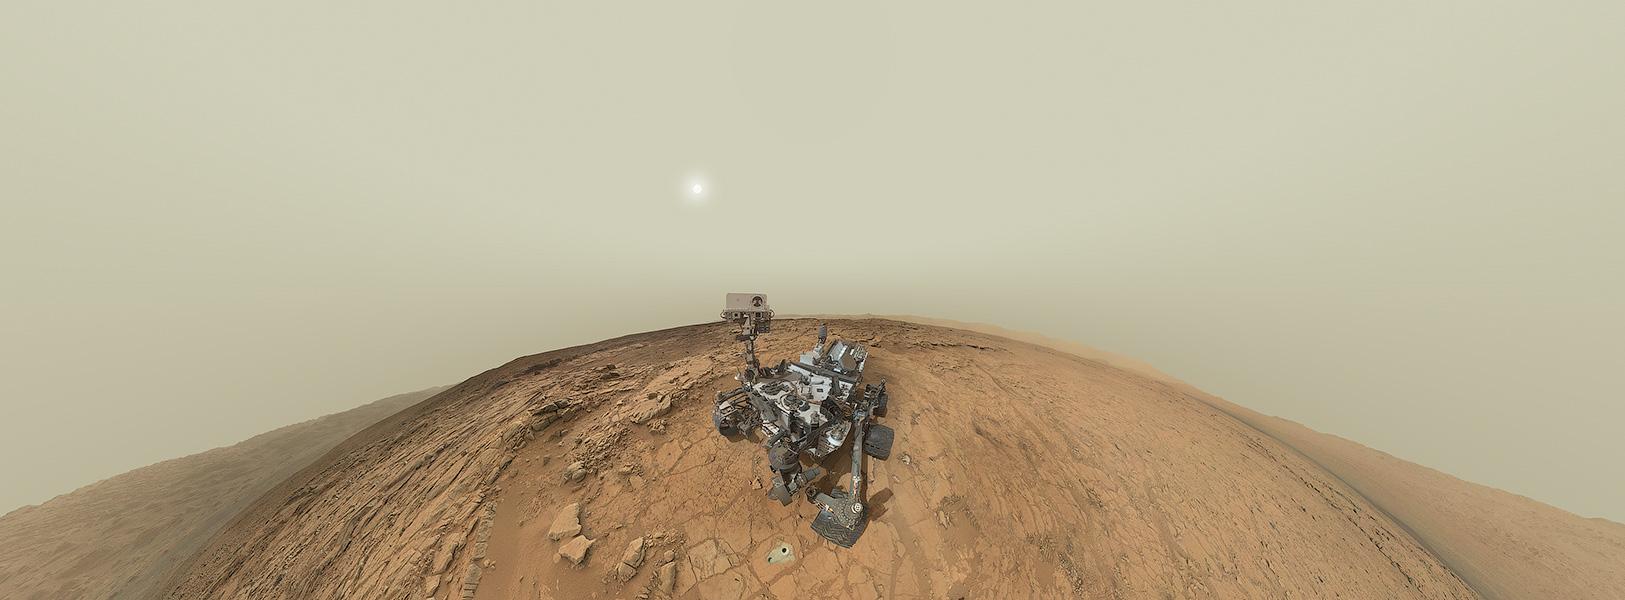 پرتره پانورامیک مریخ